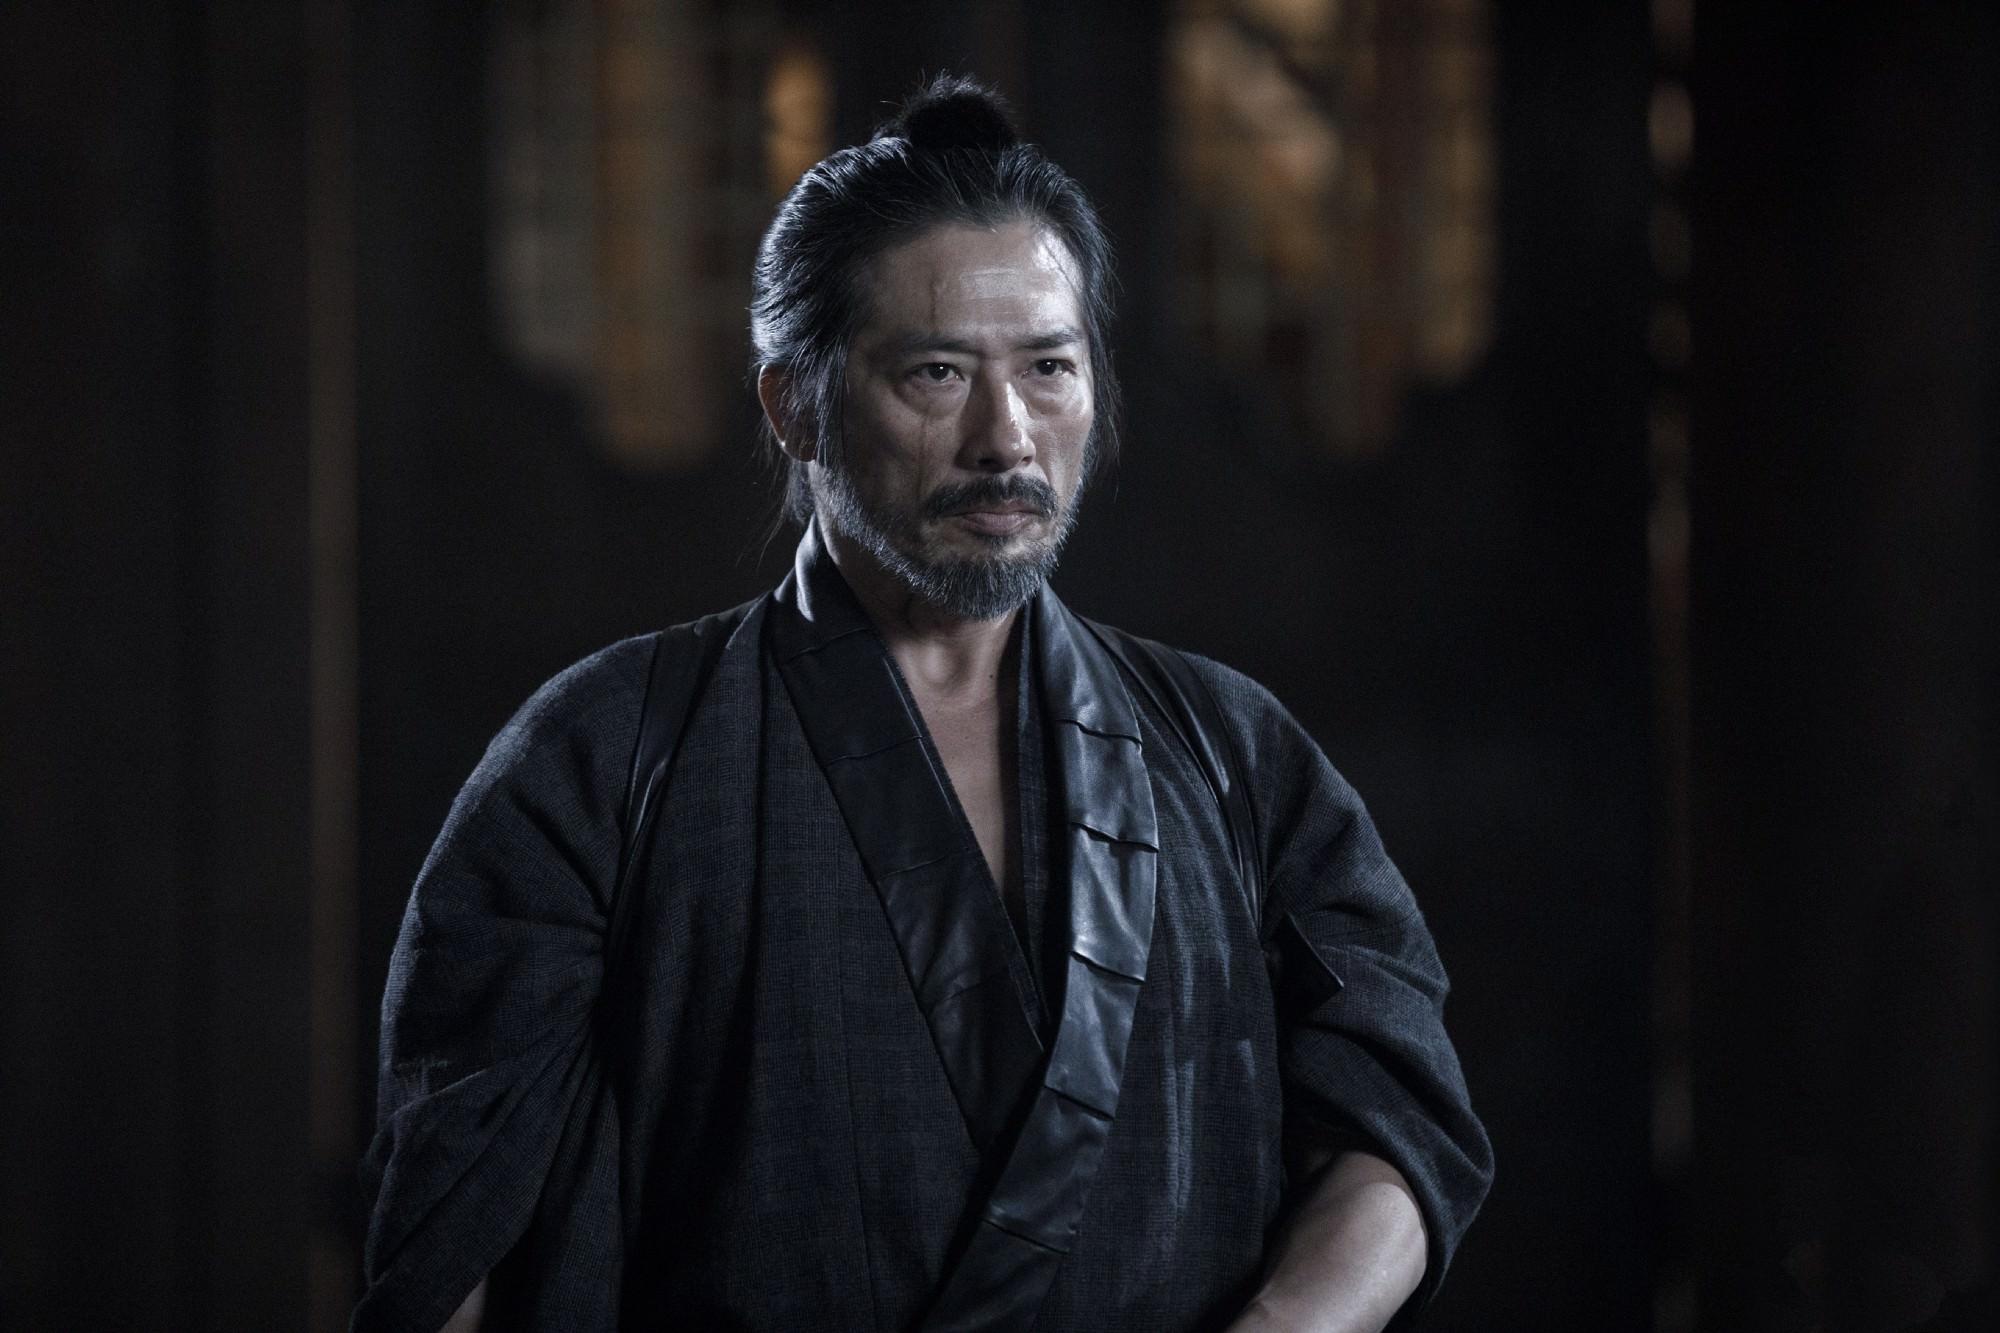 Westworld: Season 2 Episode 5 – Akane No Mai